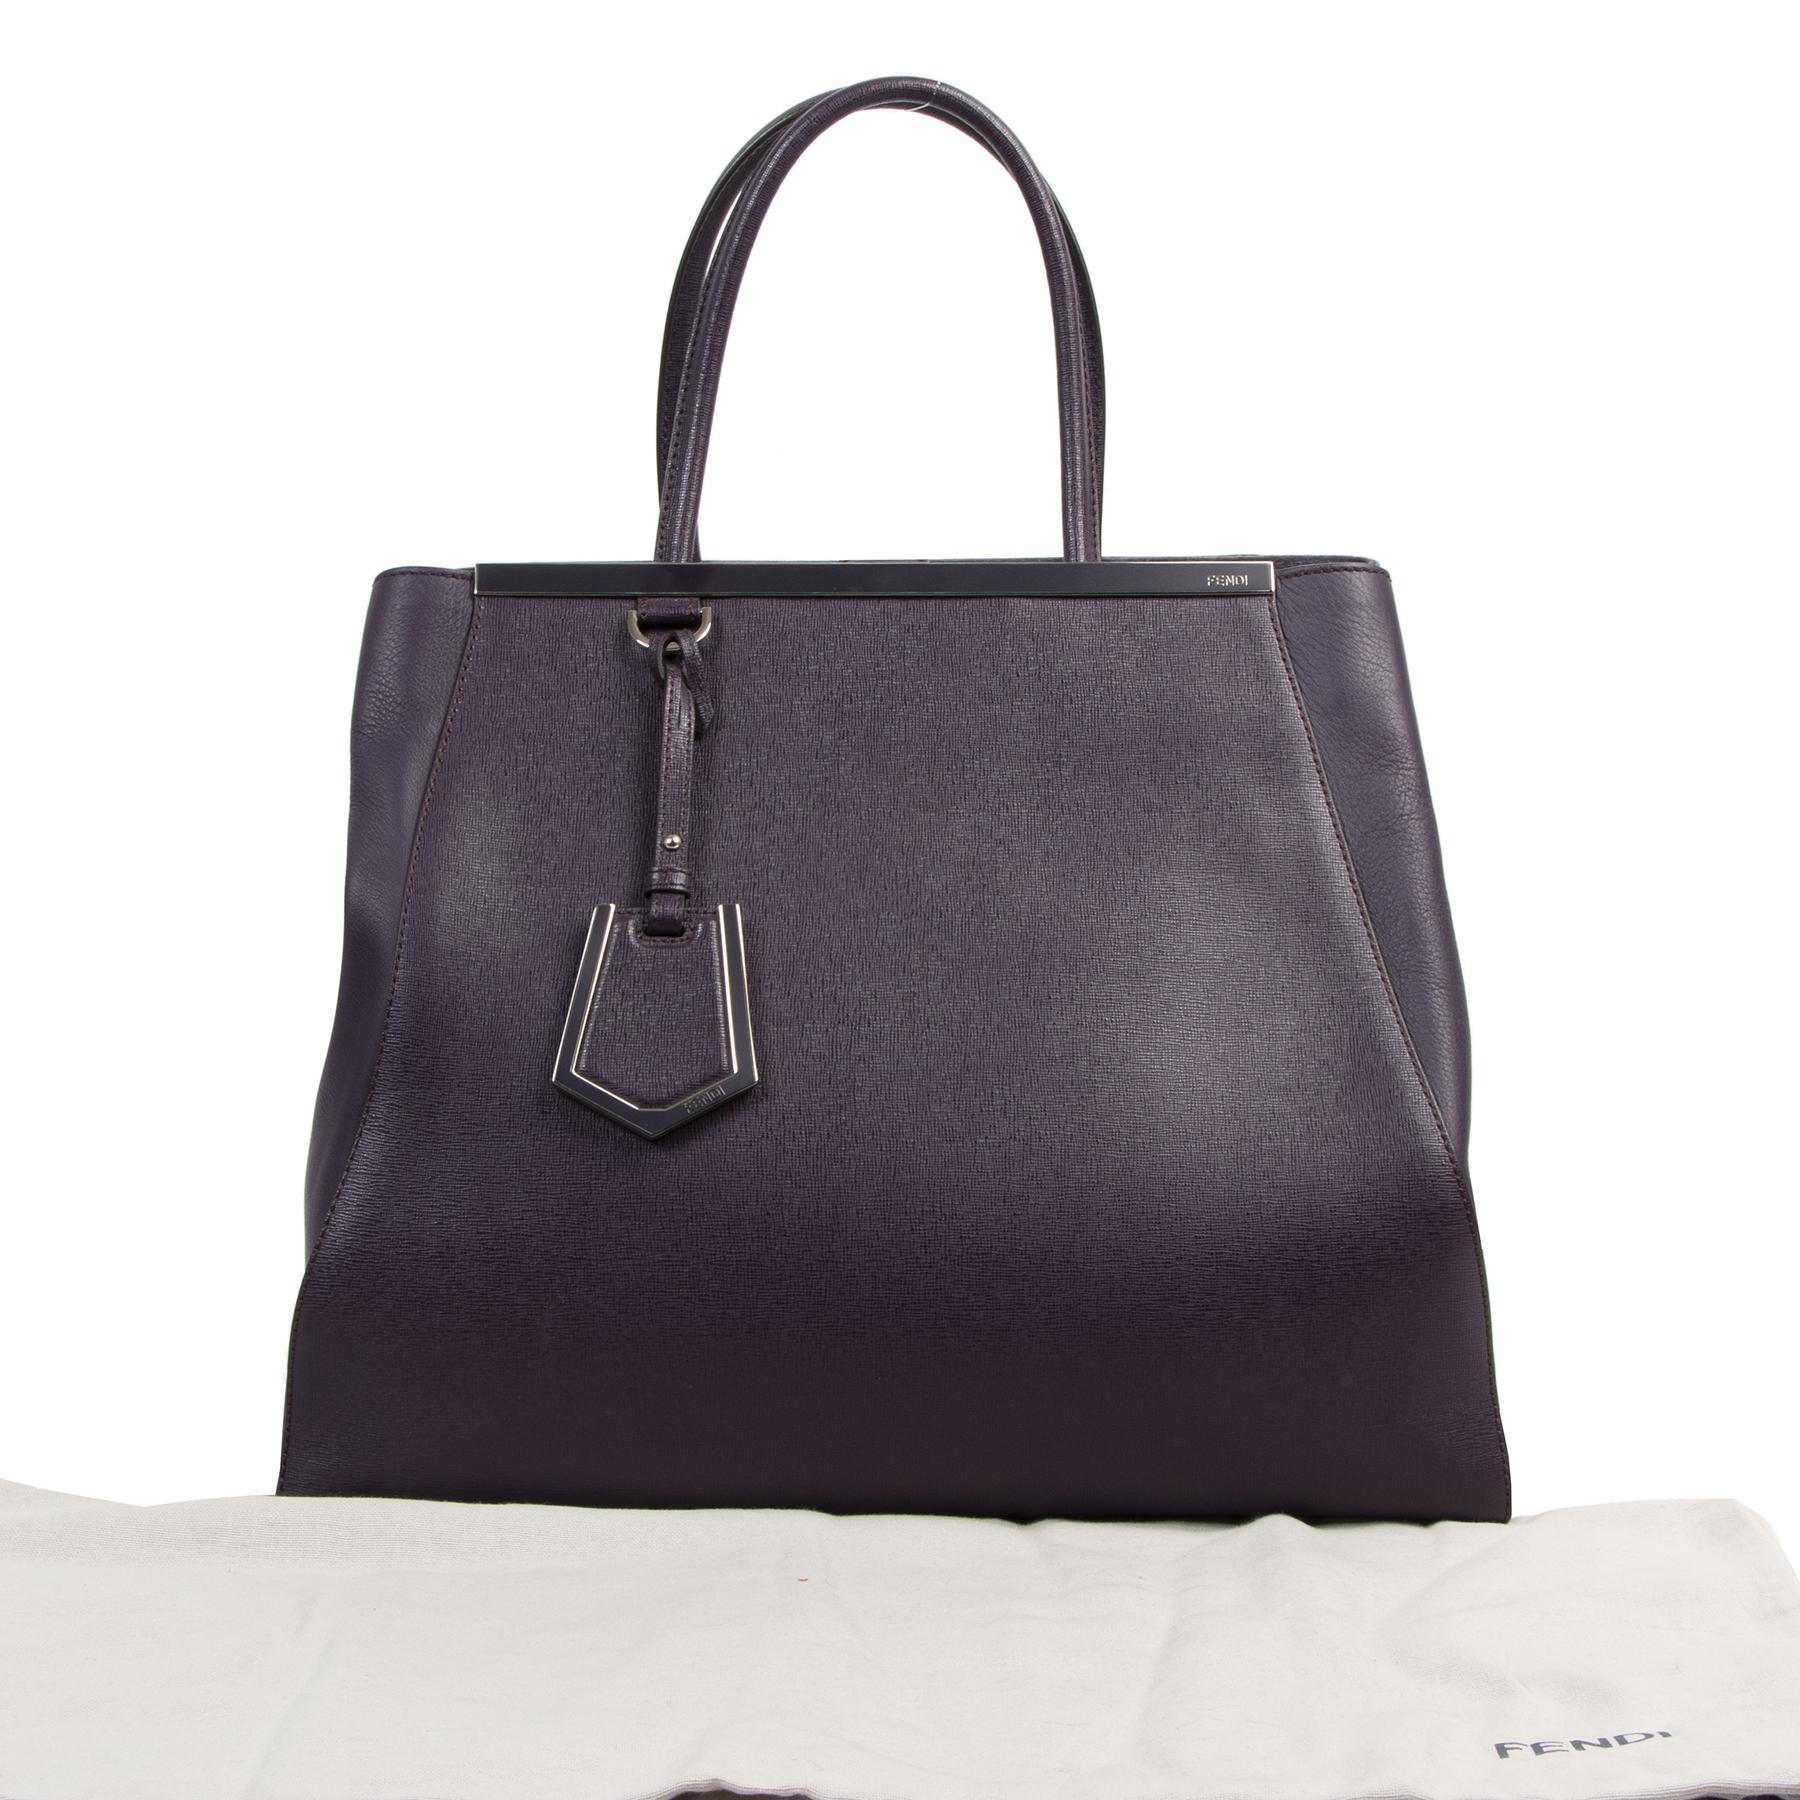 Authentieke tweedehands vintage Fendi Purple 2jours Top Handle Bag koop online webshop LabelLOV